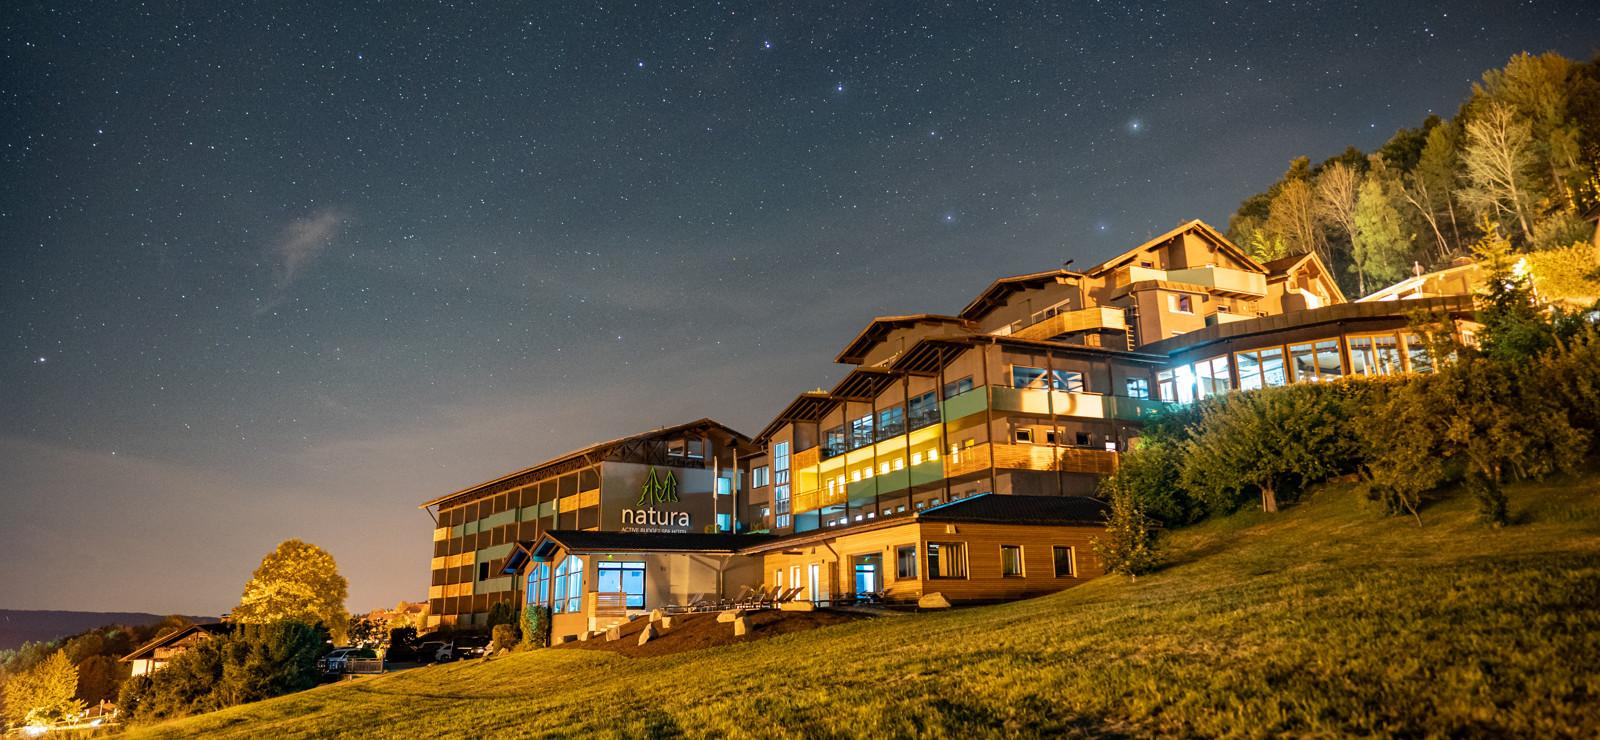 Natura Hotel Bodenmais Bilder | Bild 1